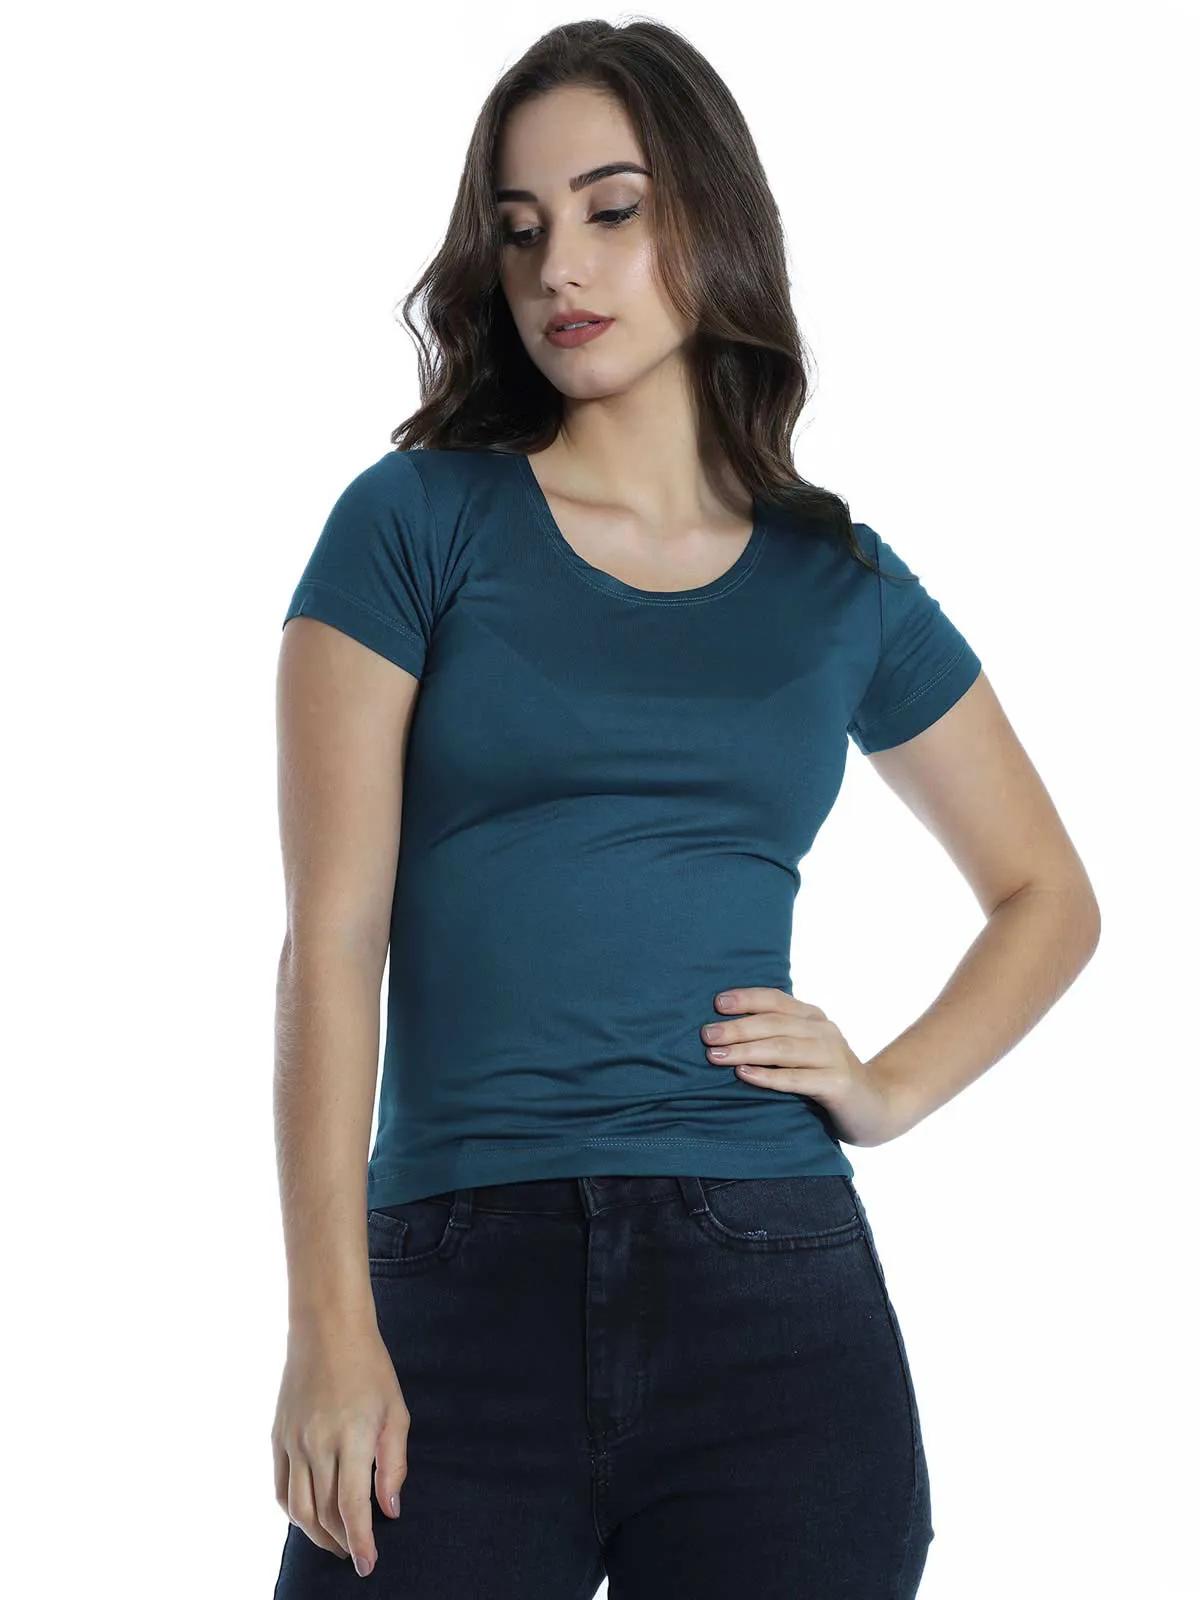 Baby Look Feminina Básica Lisa Viscolycra Decote Redondo Azul Jeans